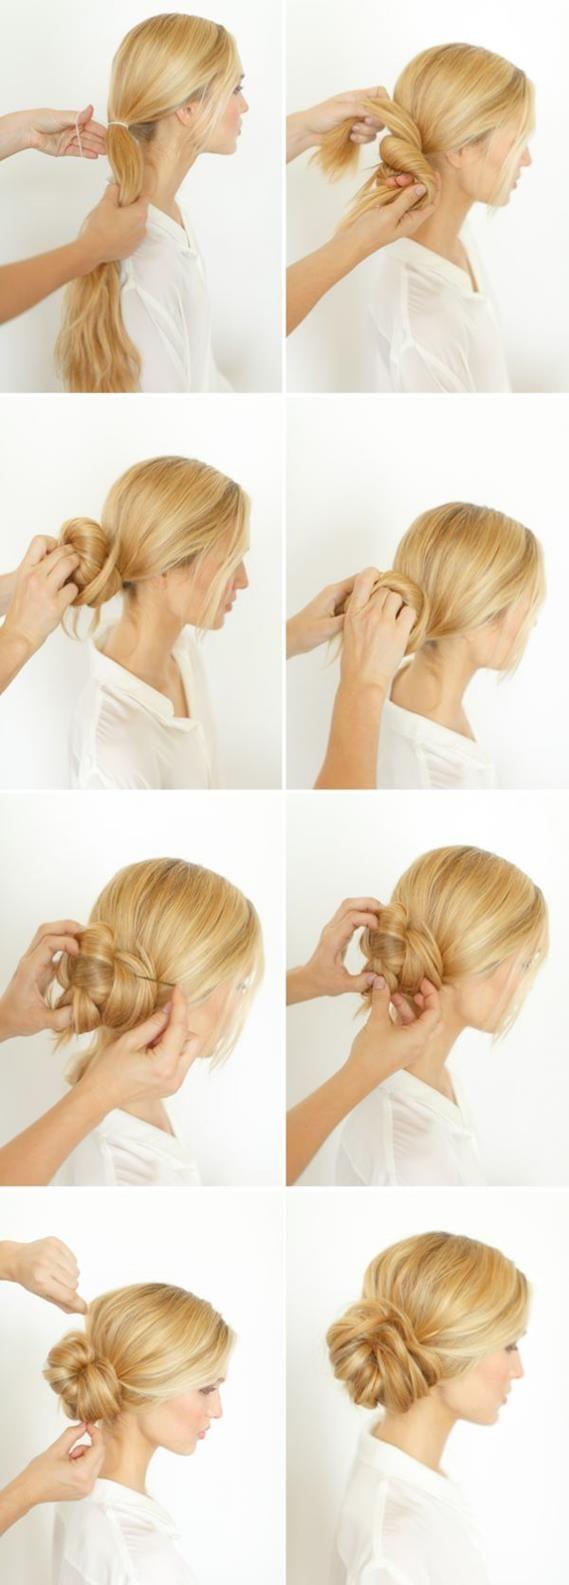 DIY Knotted Bun Wedding Hairstyle via | HAIR | Pinterest | Hair ...